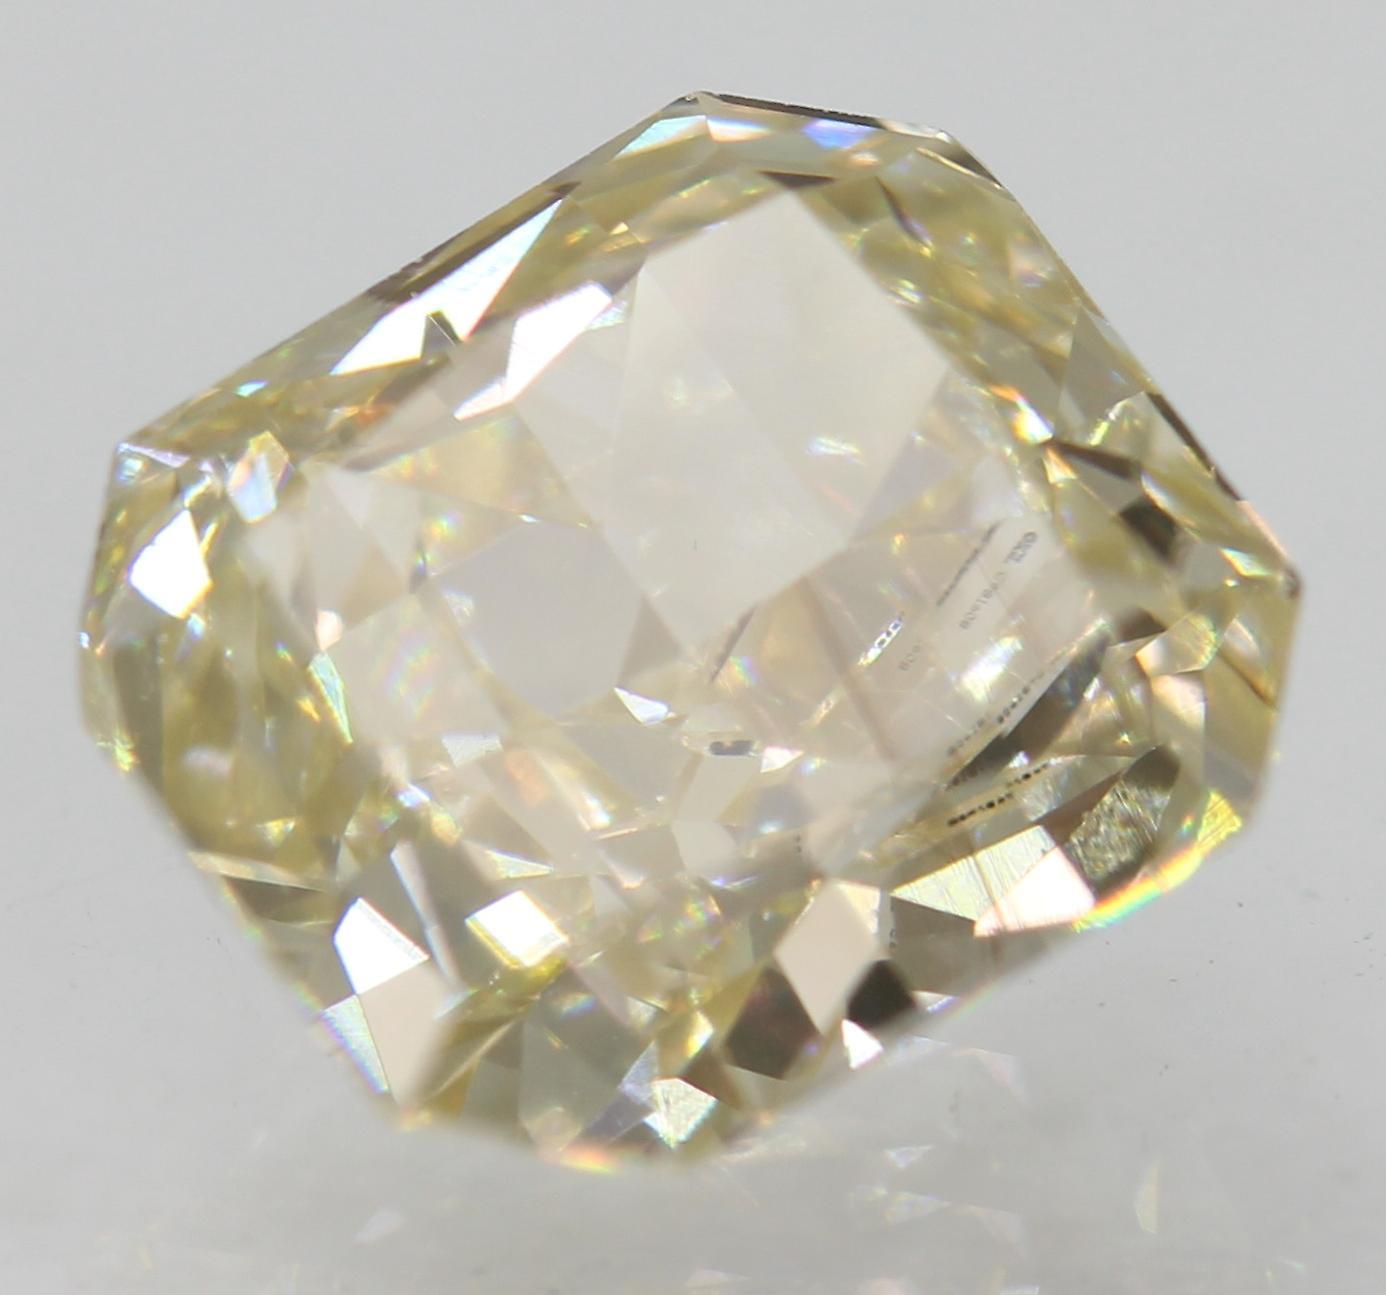 Certified 1.52 Carat J VVS1 Radiant Enhanced Natural Loose Diamond 6.88x6.25mm